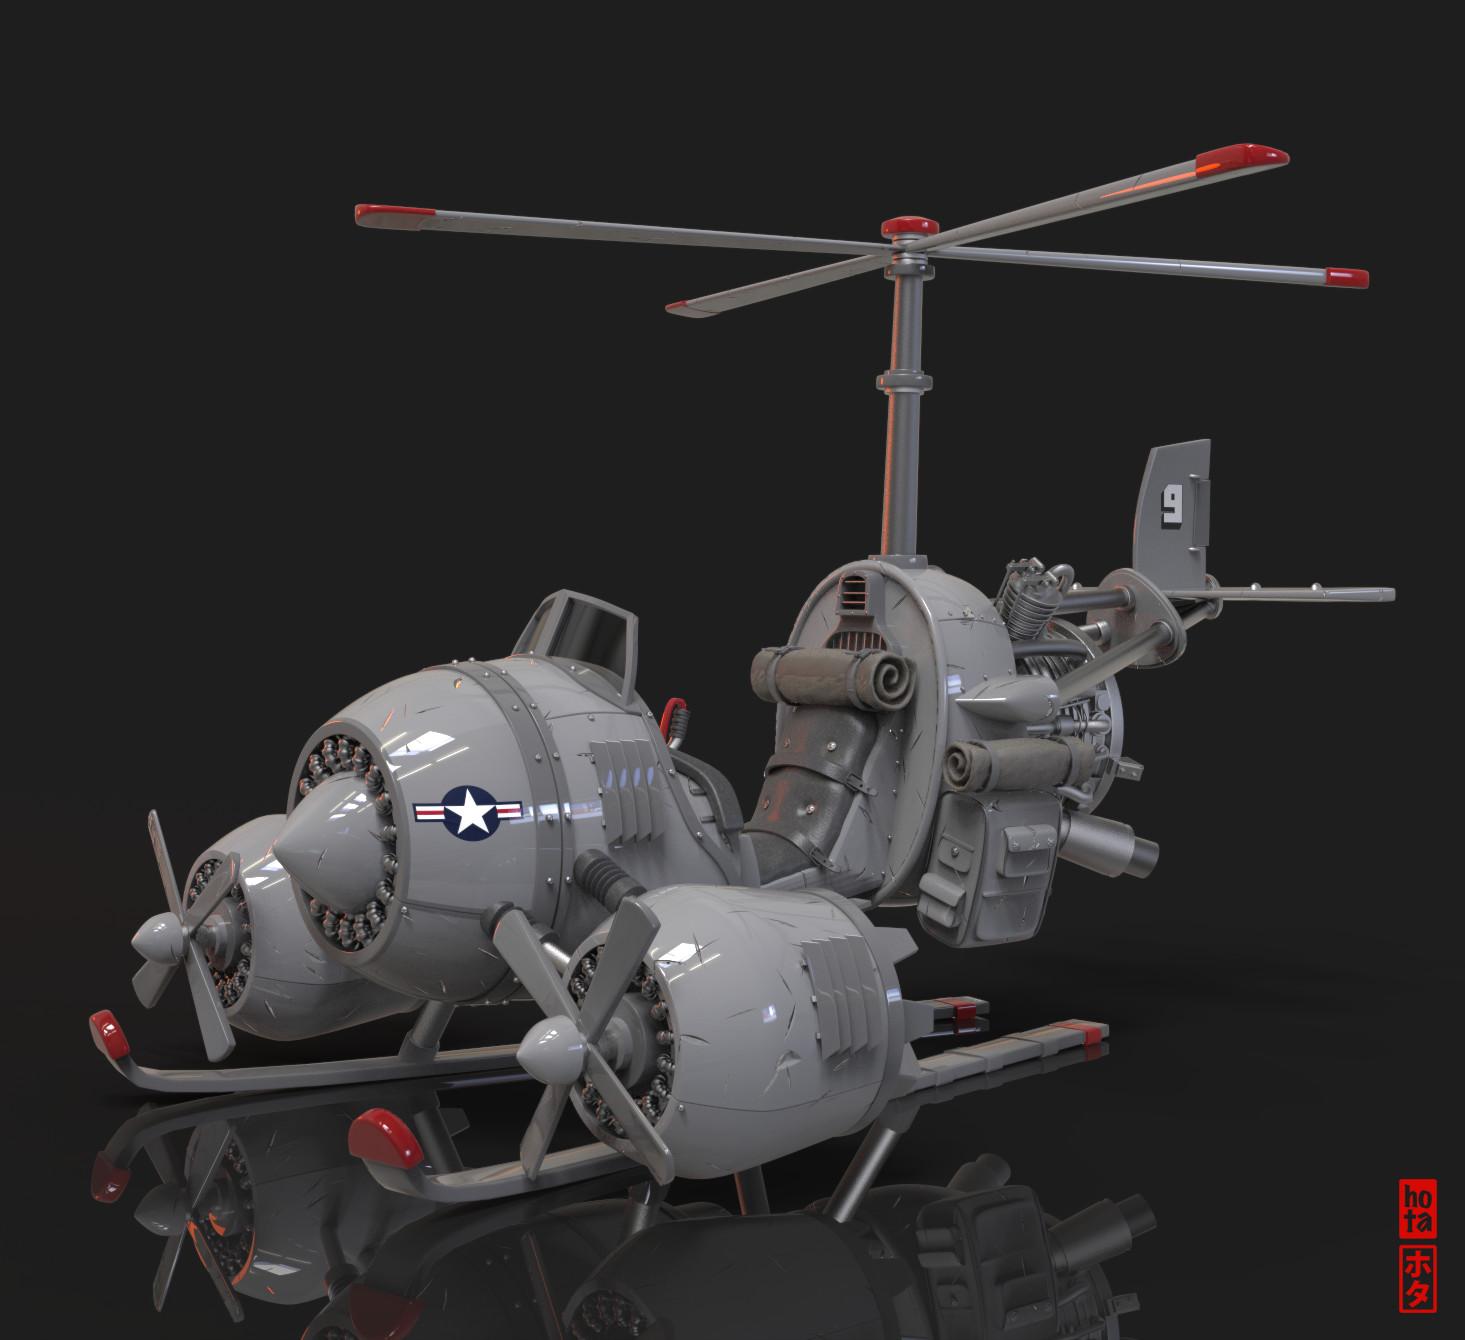 Hota aisa chorrocoptero final9